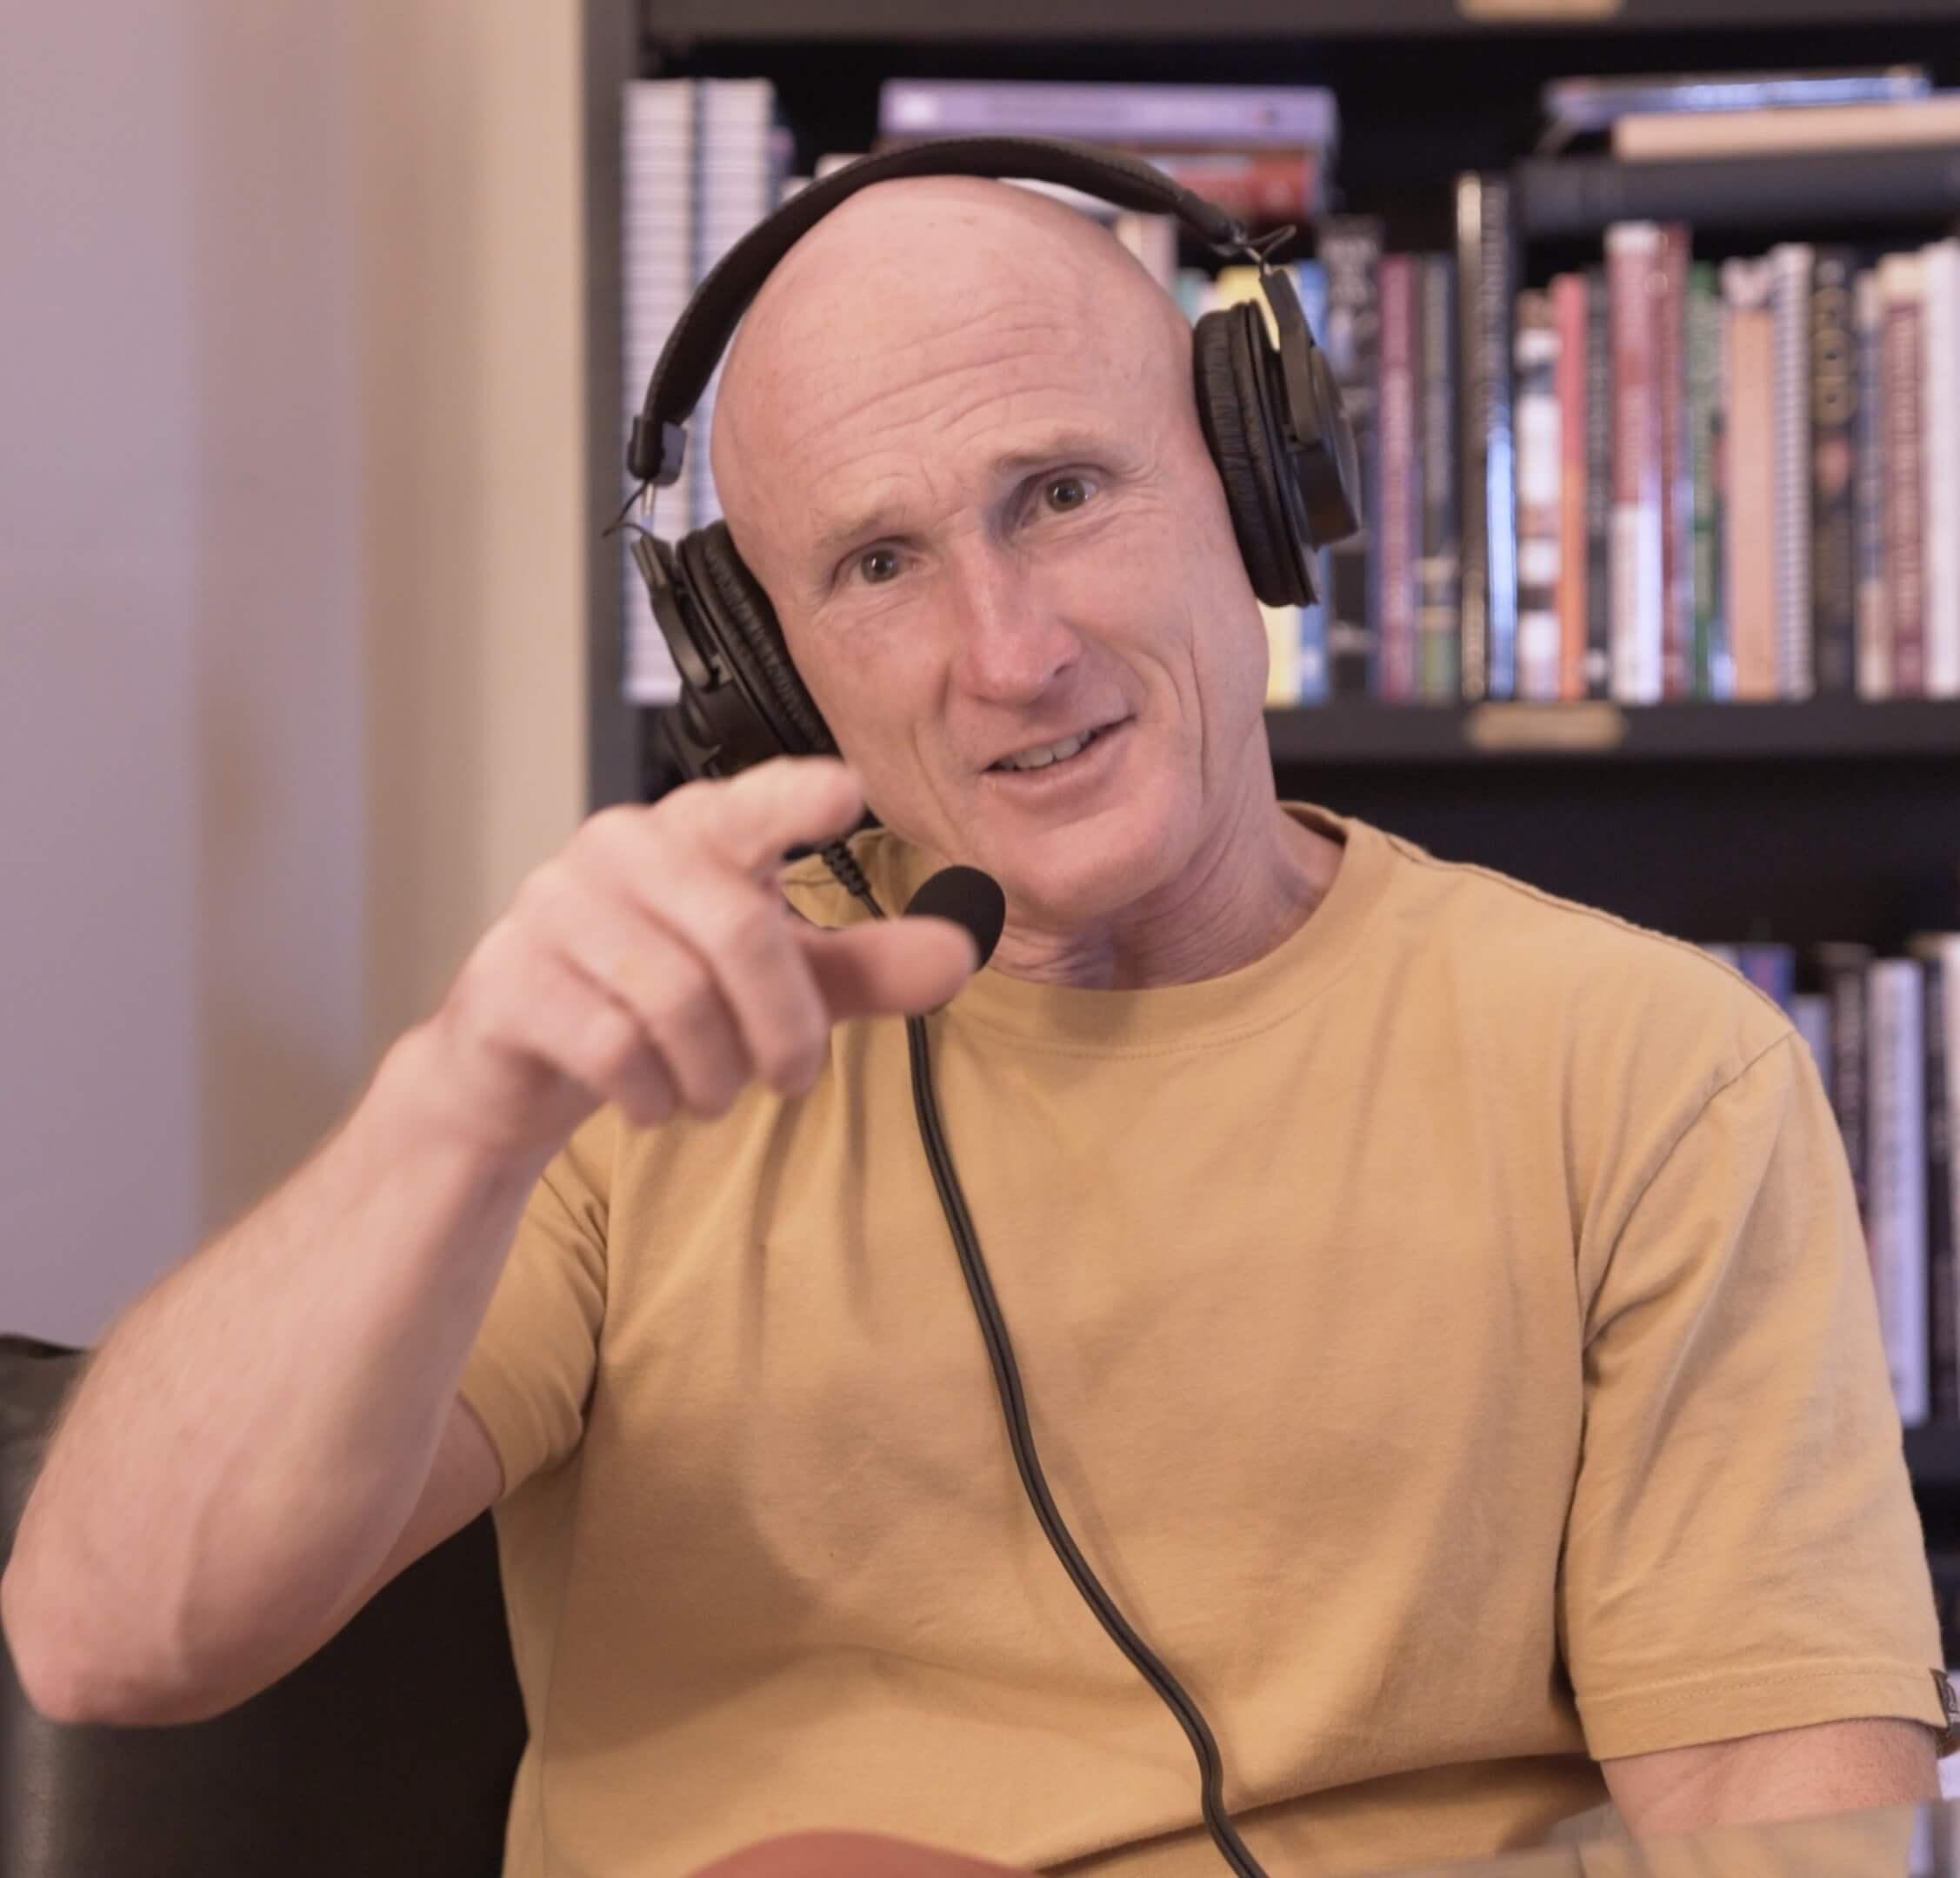 Paul Chek Headphones